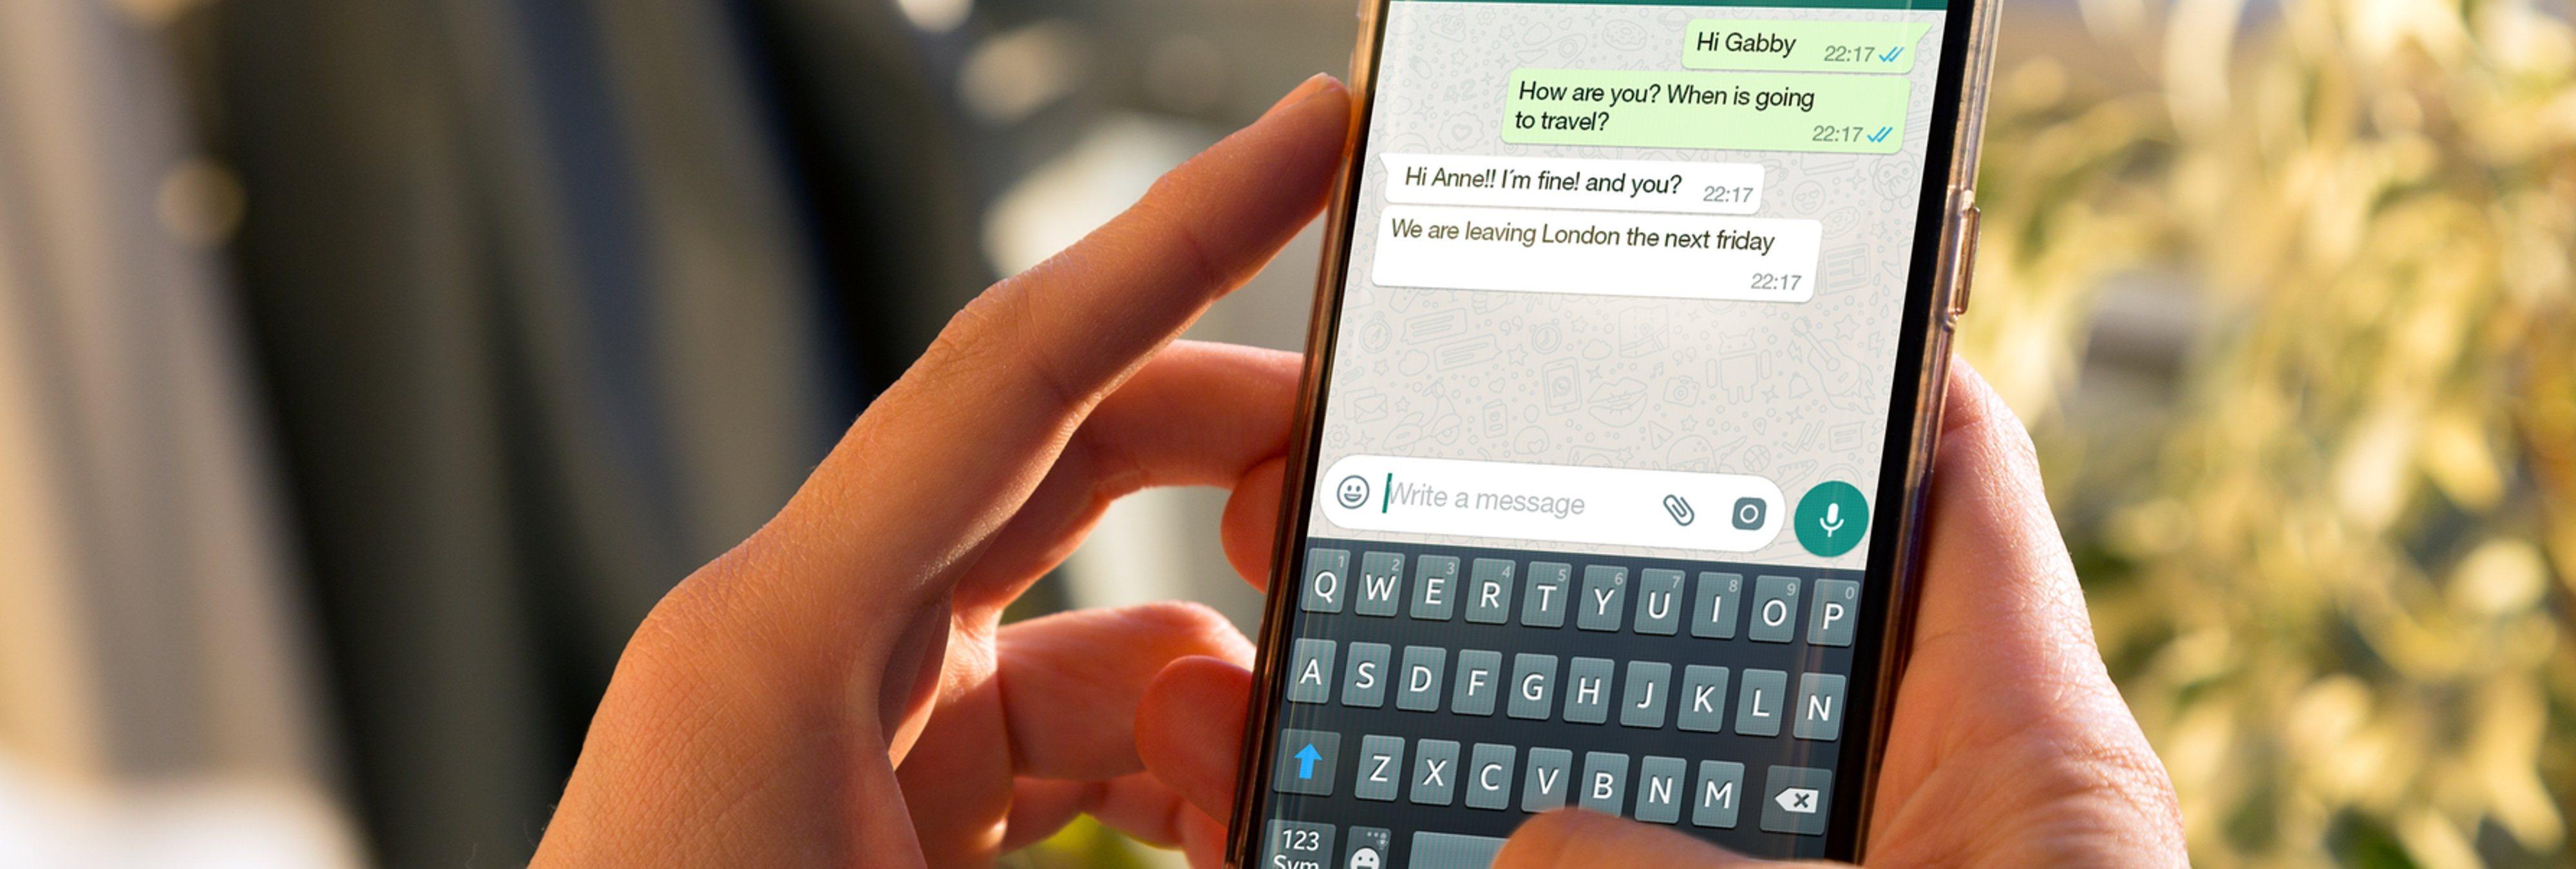 Una adolescente busca familia adoptiva a su futuro bebé a través de WhatsApp